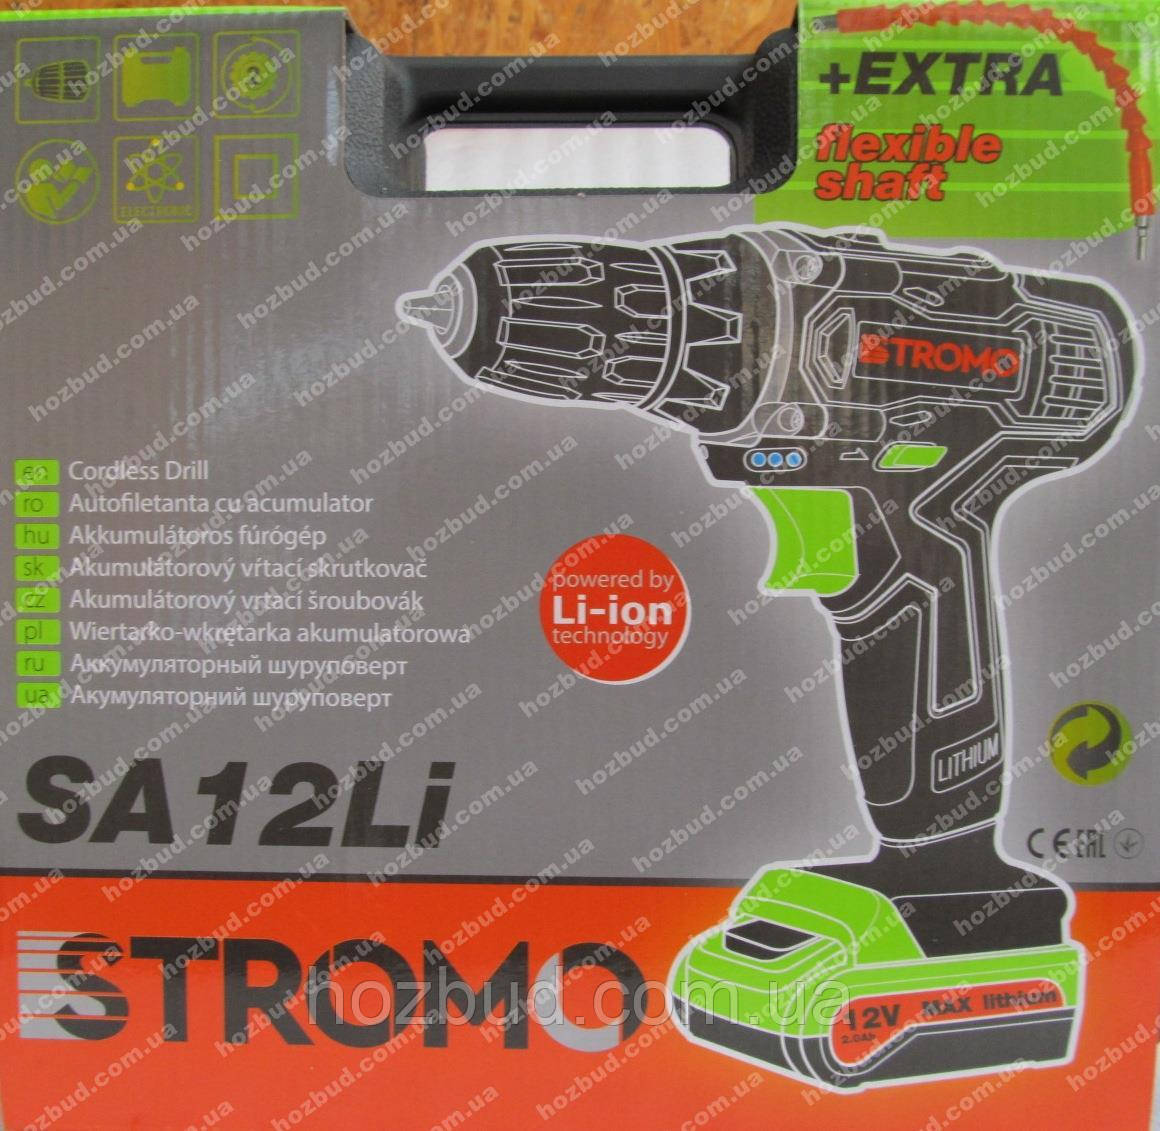 Шуруповерт аккумуляторный Stromo SA 12Li